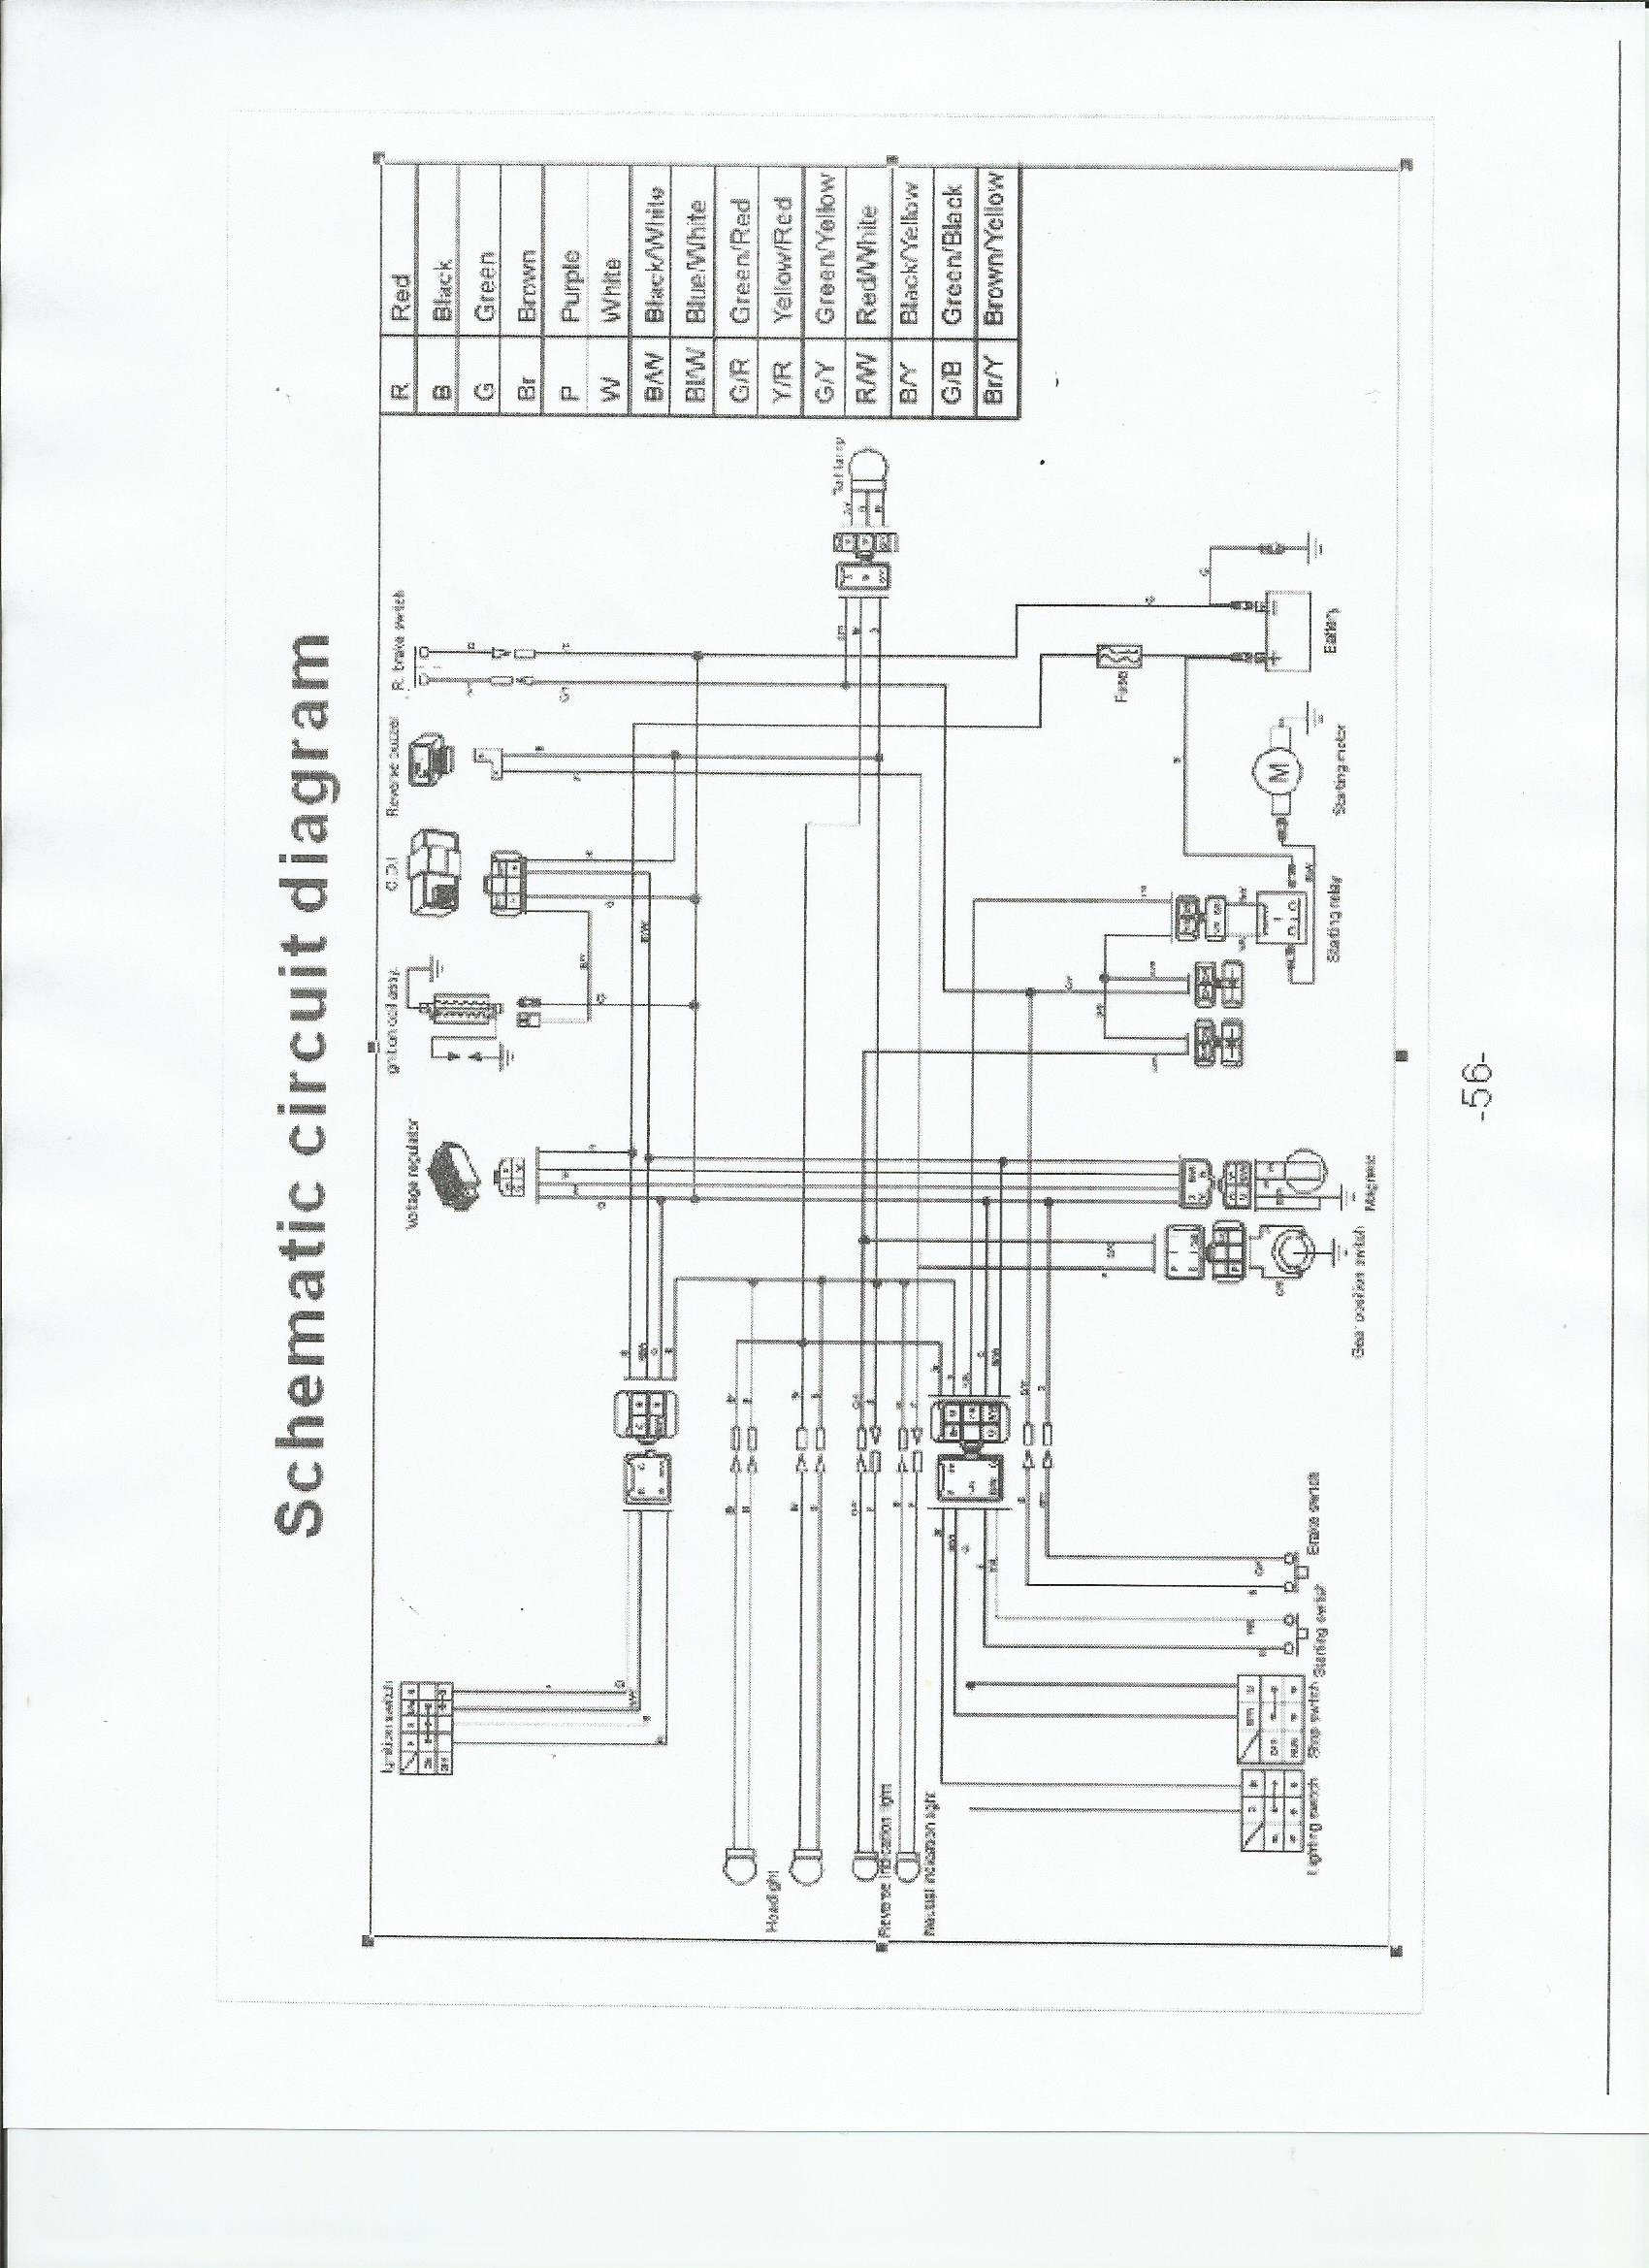 Palomino rv wiring diagram jzgreentown wiring diagram for palomino rv electrical wiring for rv asfbconference2016 Gallery